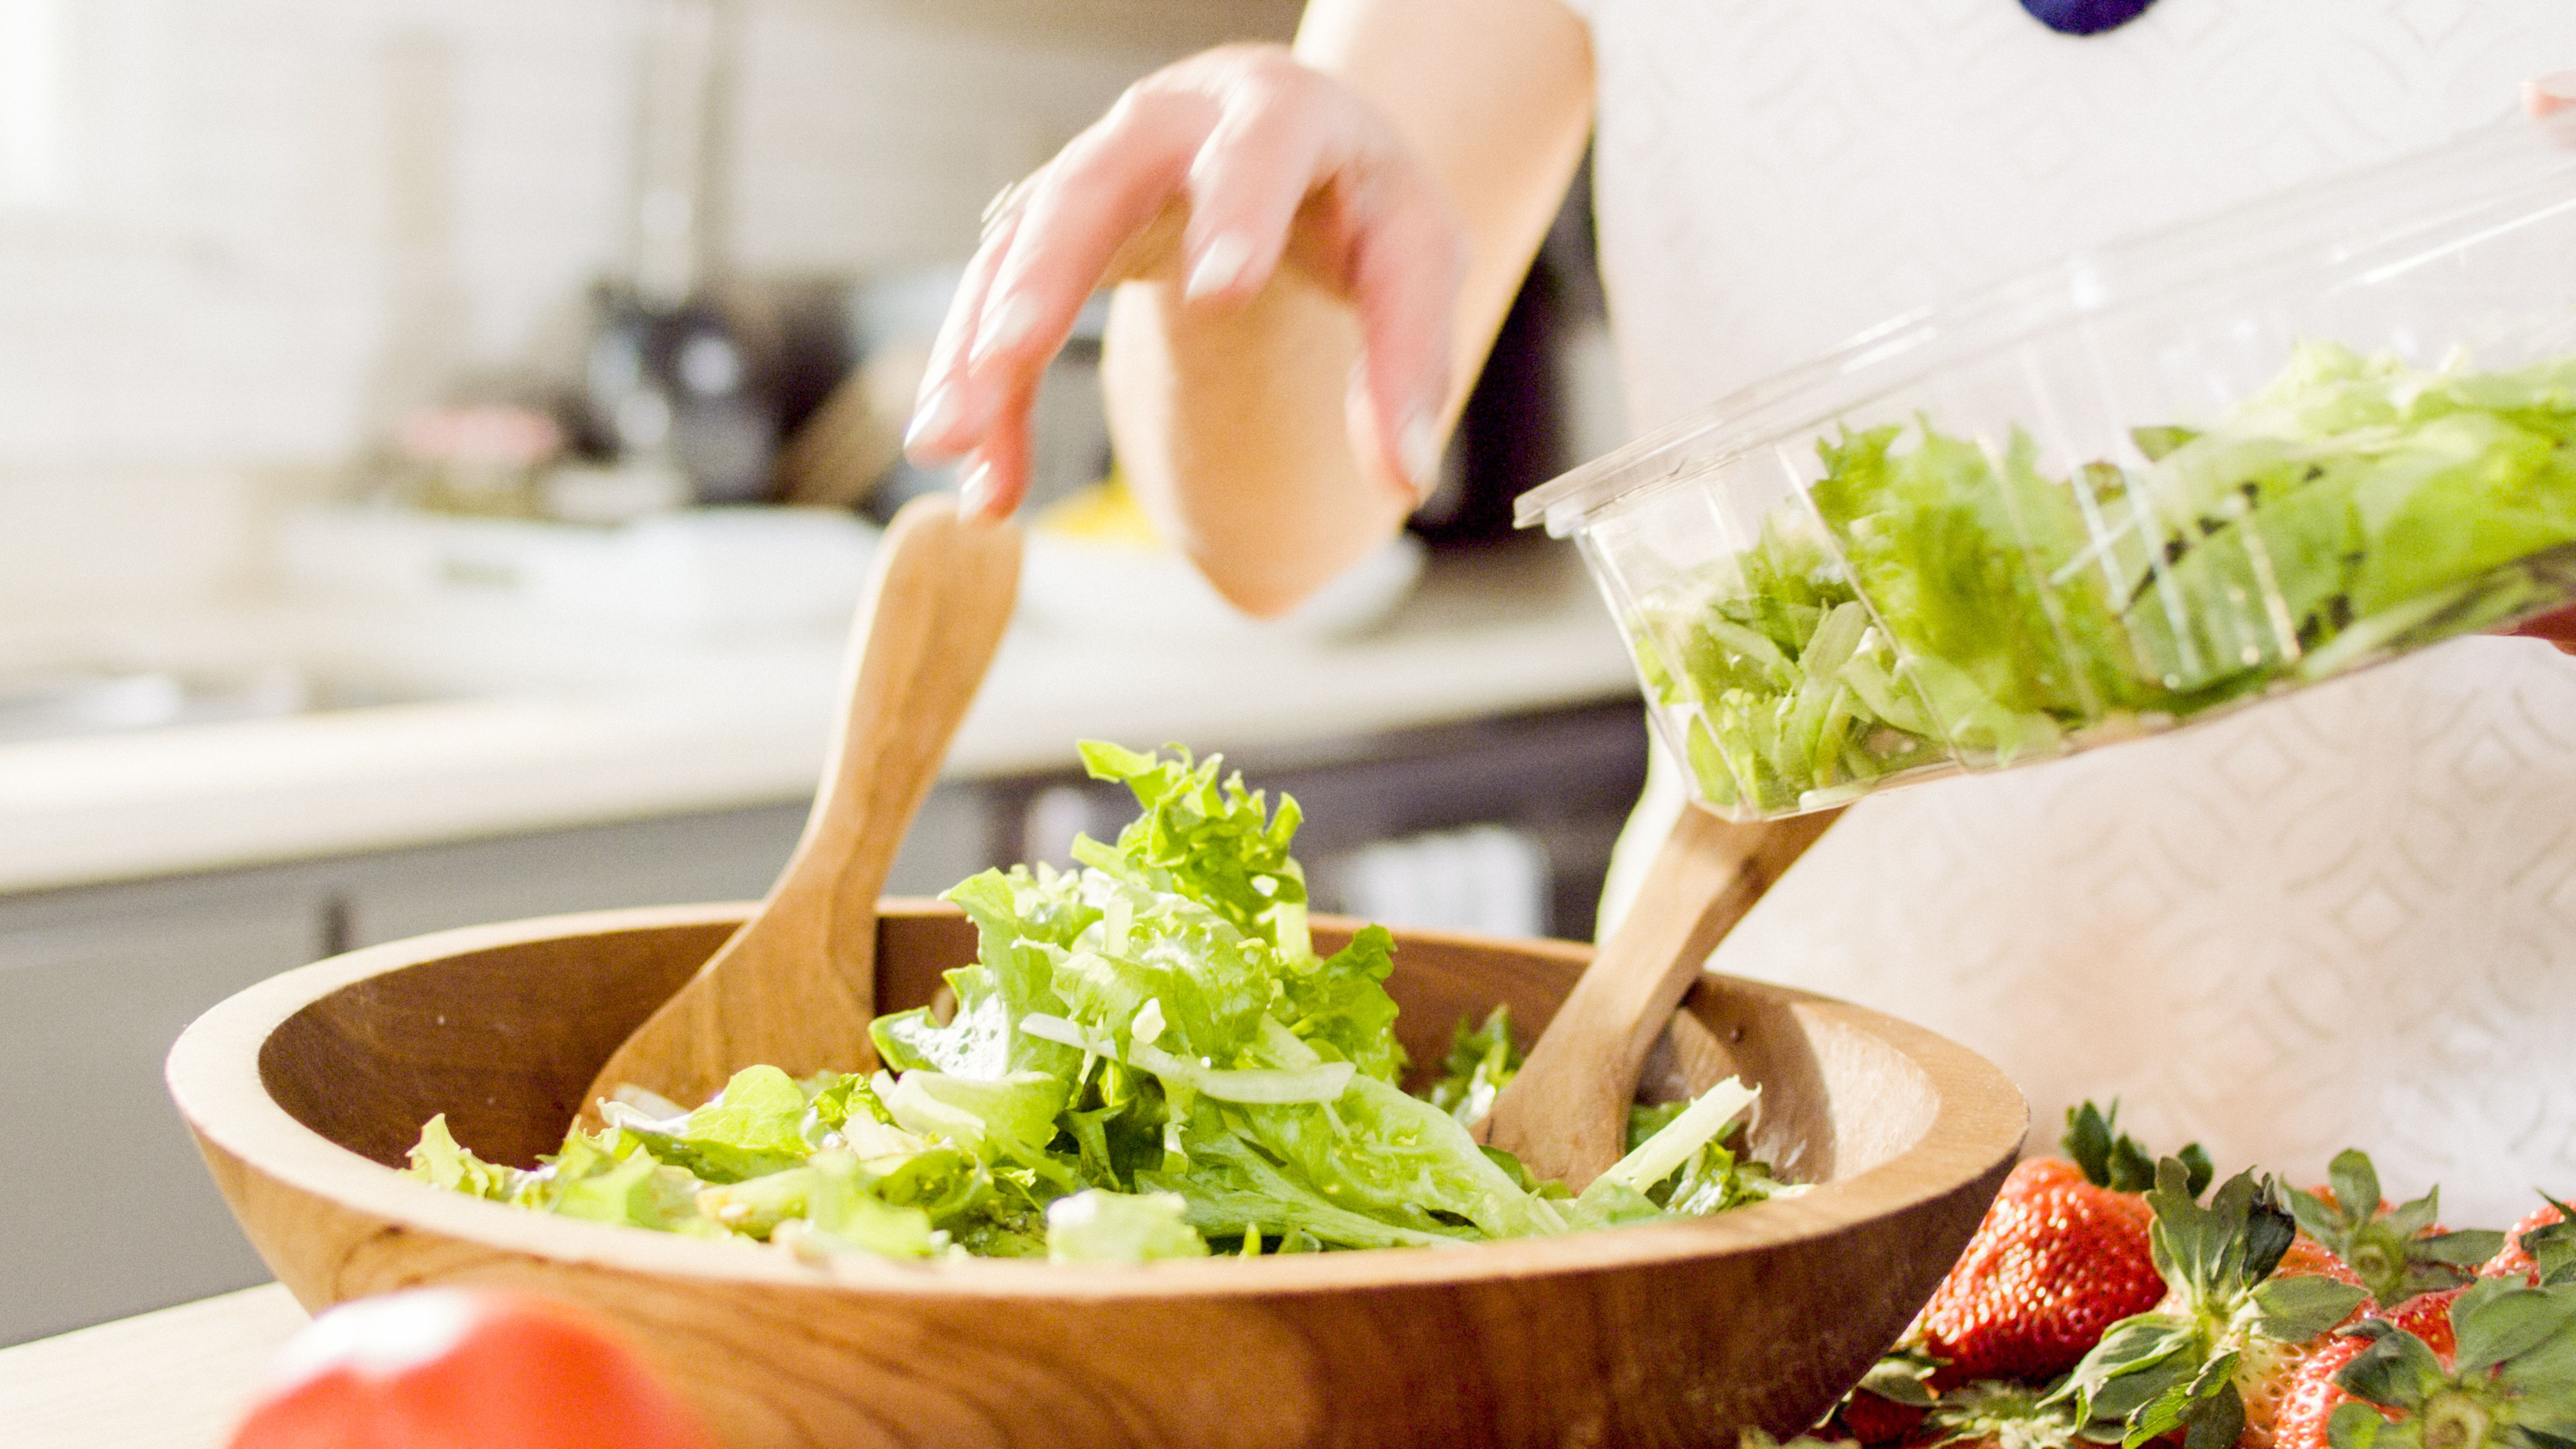 BrightFarms Salad in Bowl | No Need to Wash